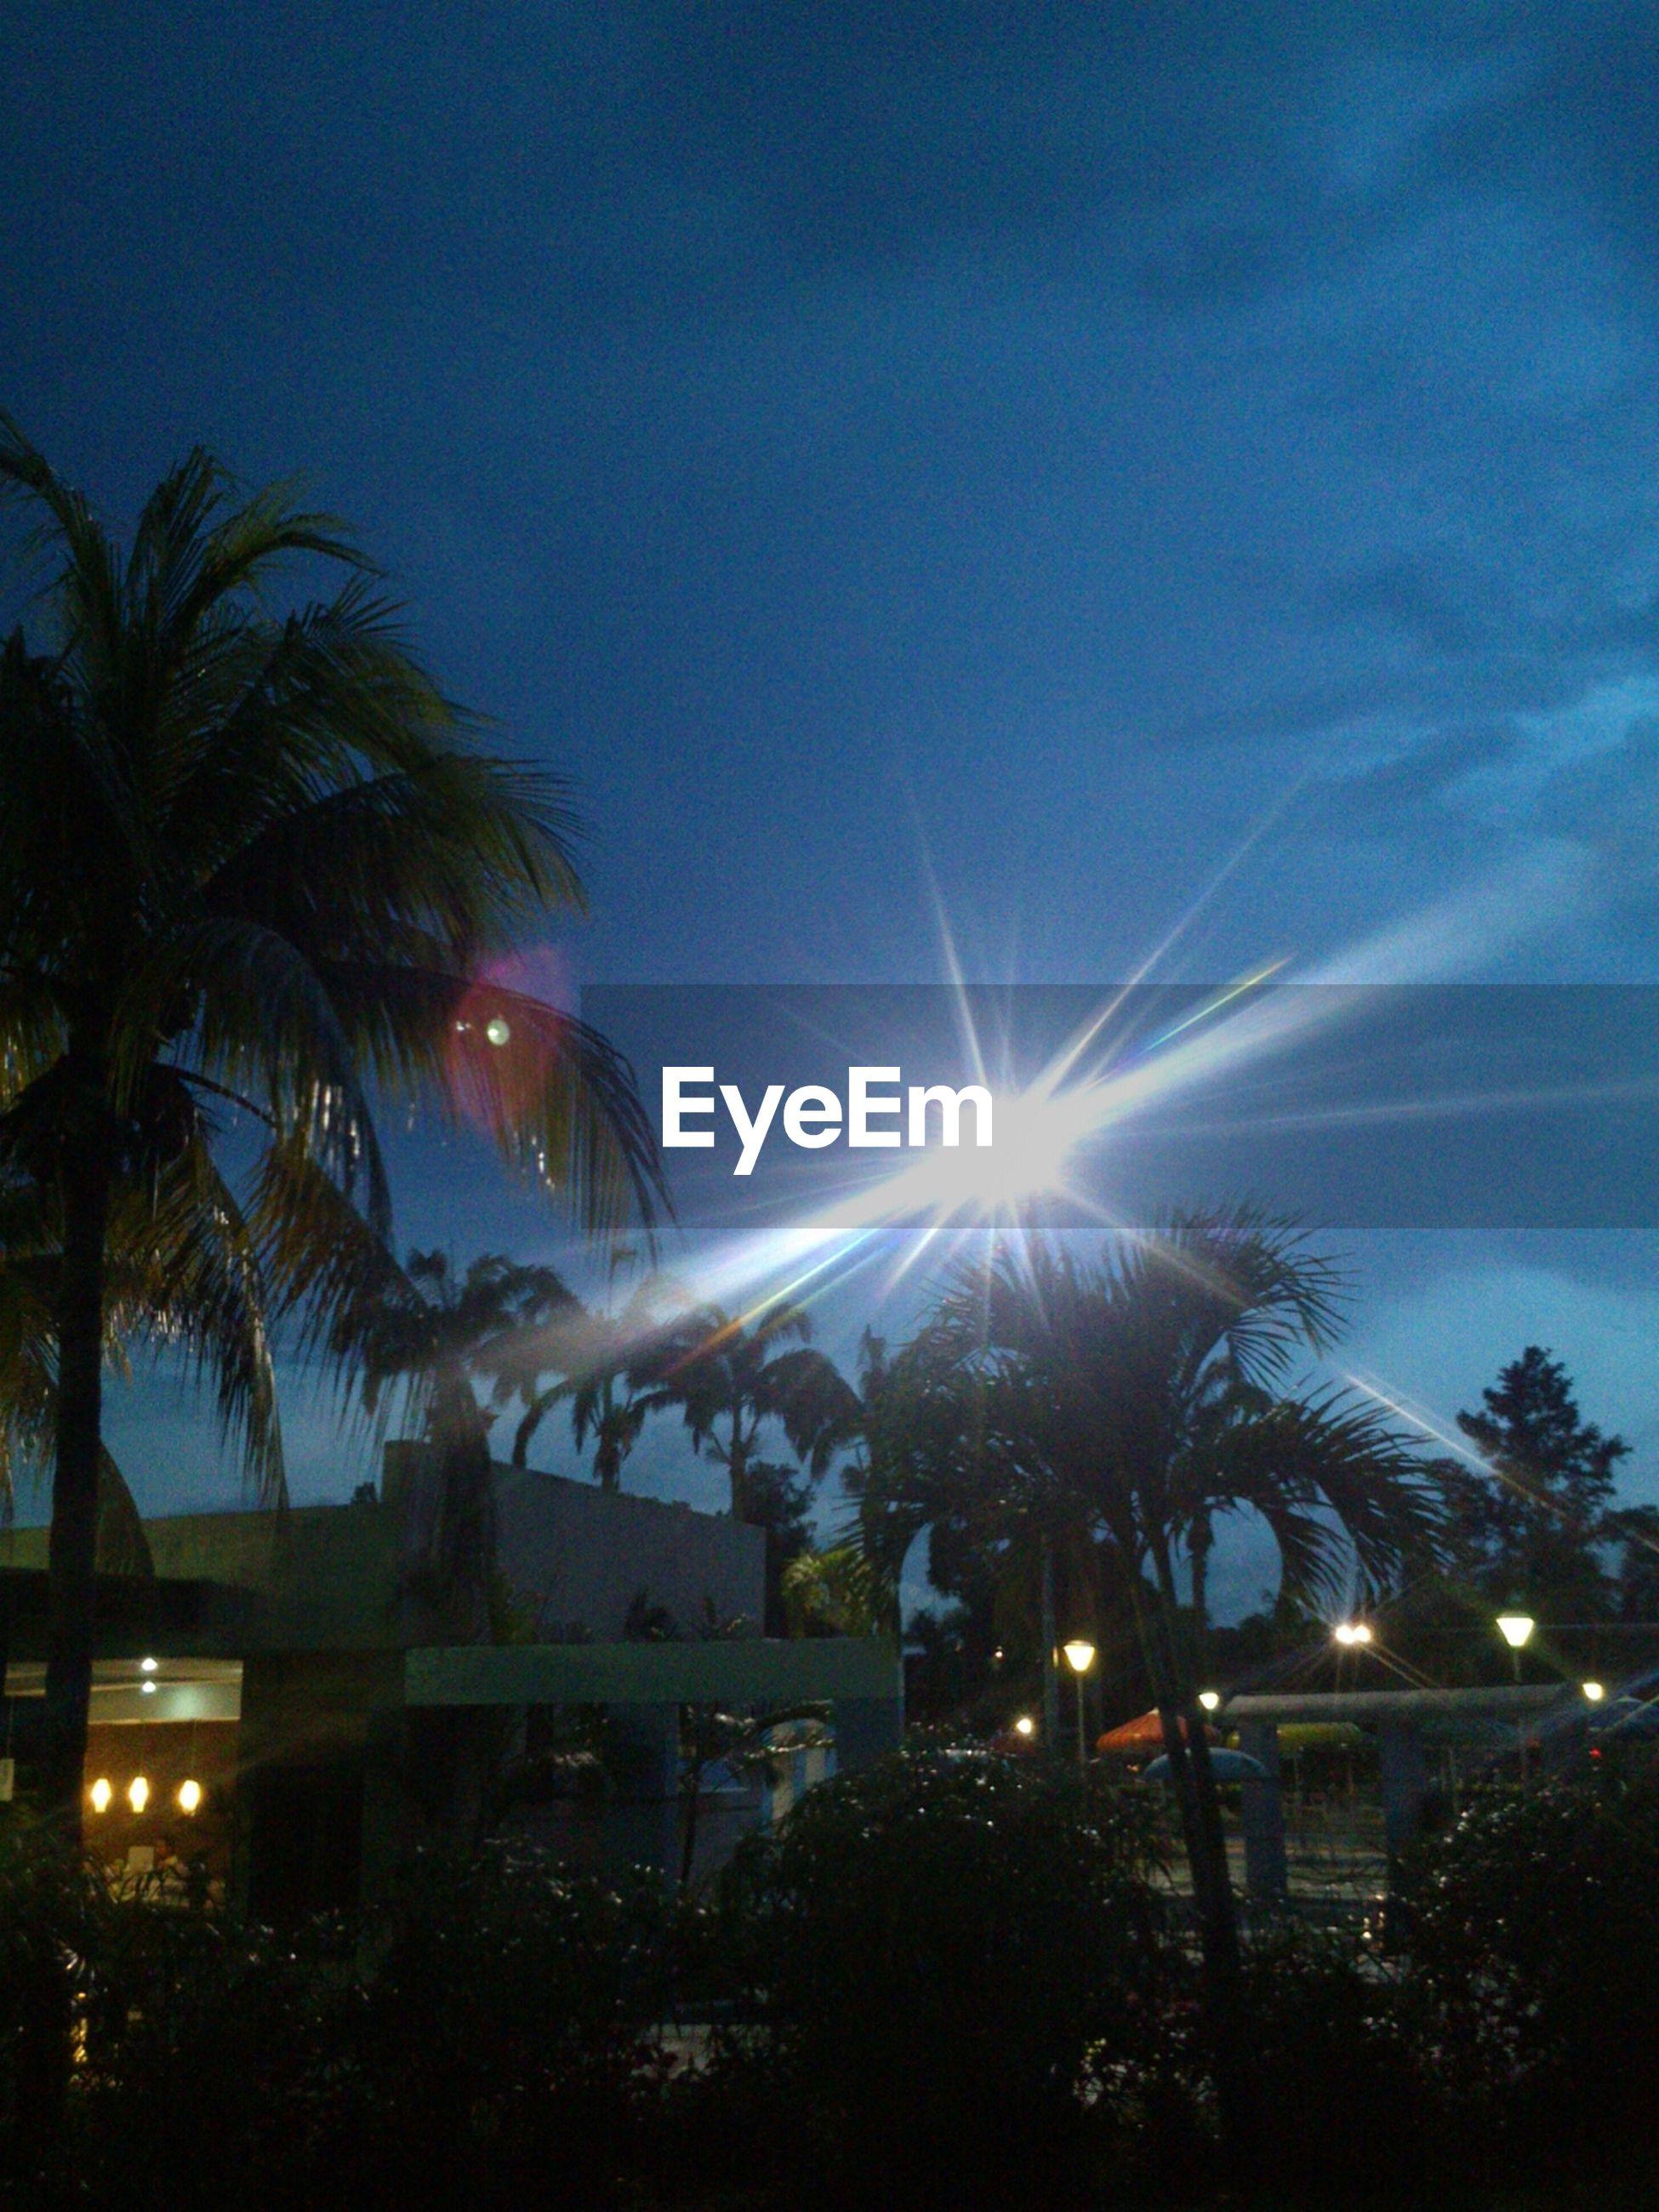 illuminated, tree, building exterior, sky, built structure, lens flare, sun, low angle view, architecture, night, street light, blue, silhouette, palm tree, lighting equipment, sunbeam, city, sunlight, dusk, clear sky